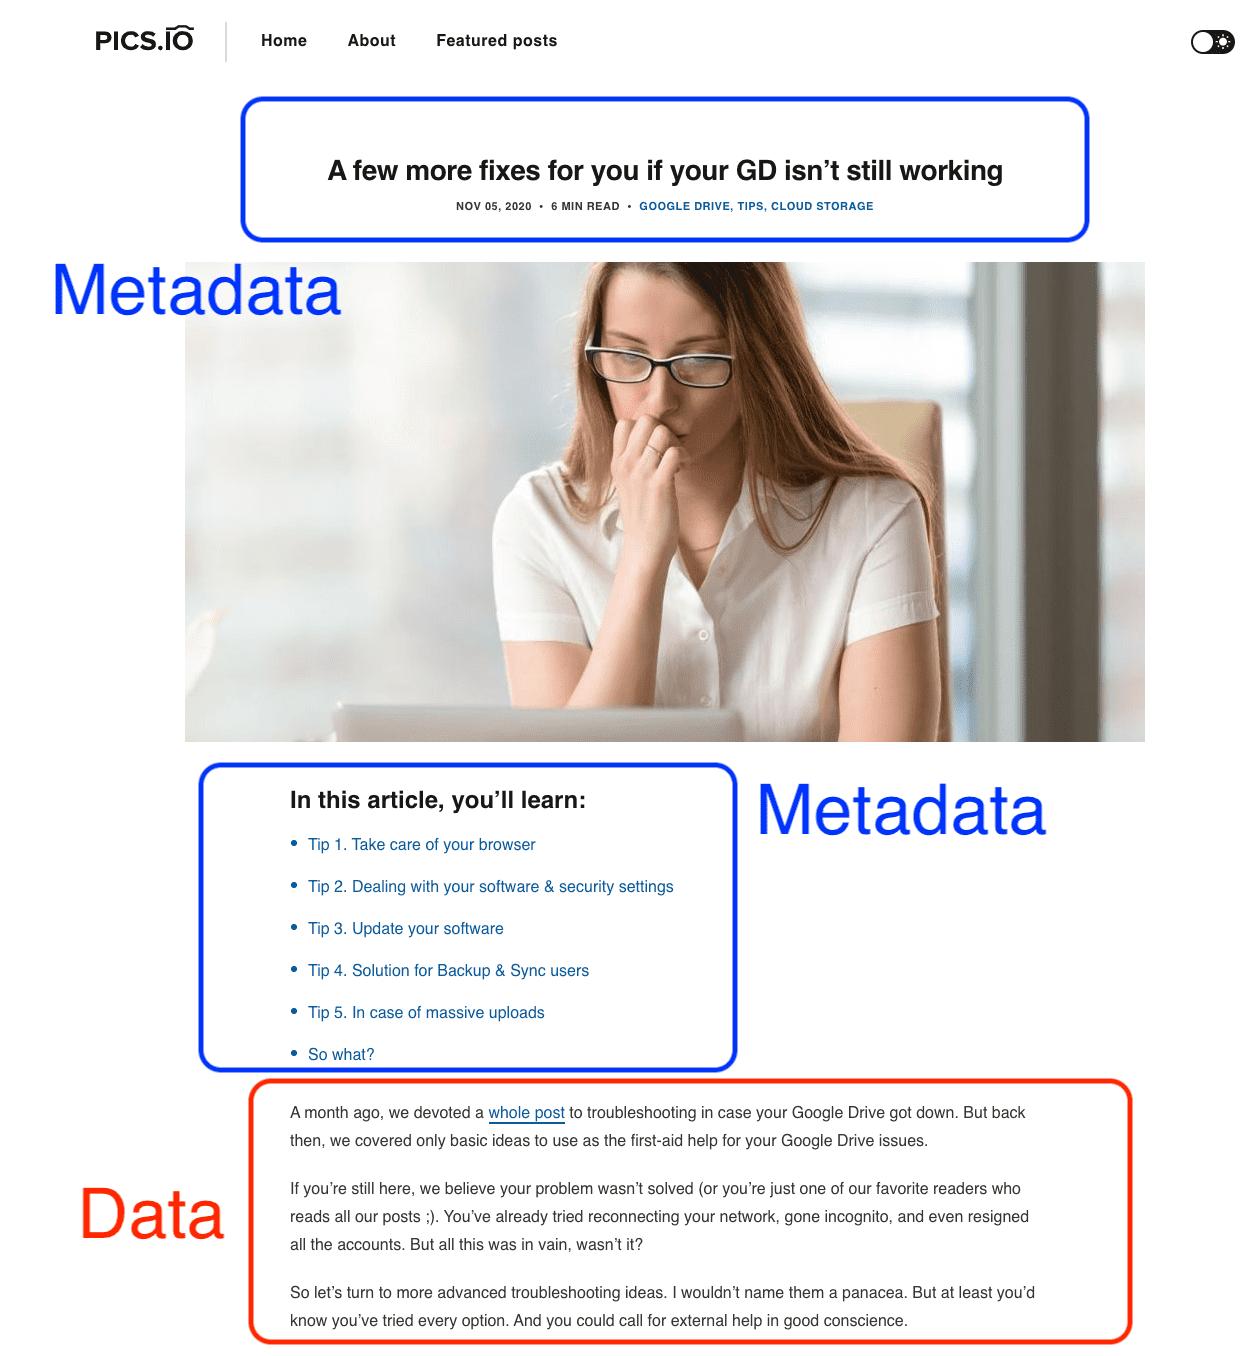 Blog post metadata